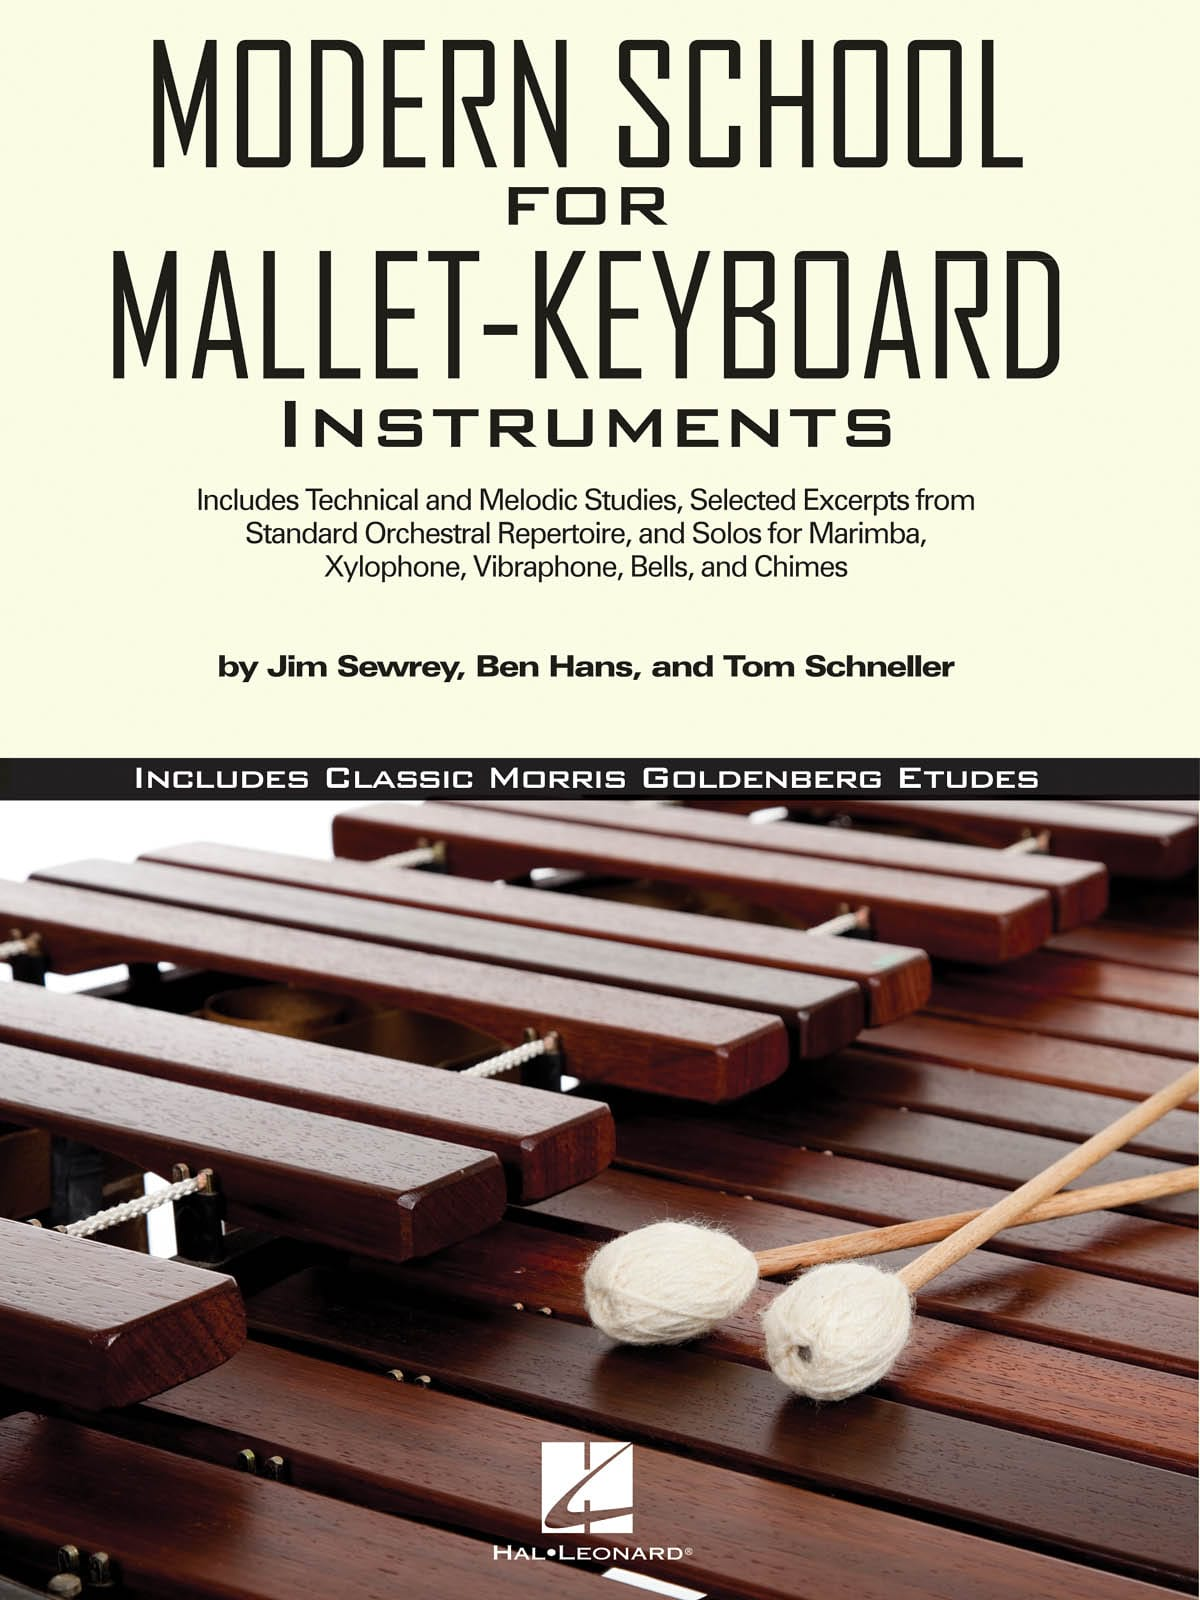 Modern School For Mallet-Keyboard Instruments - laflutedepan.com